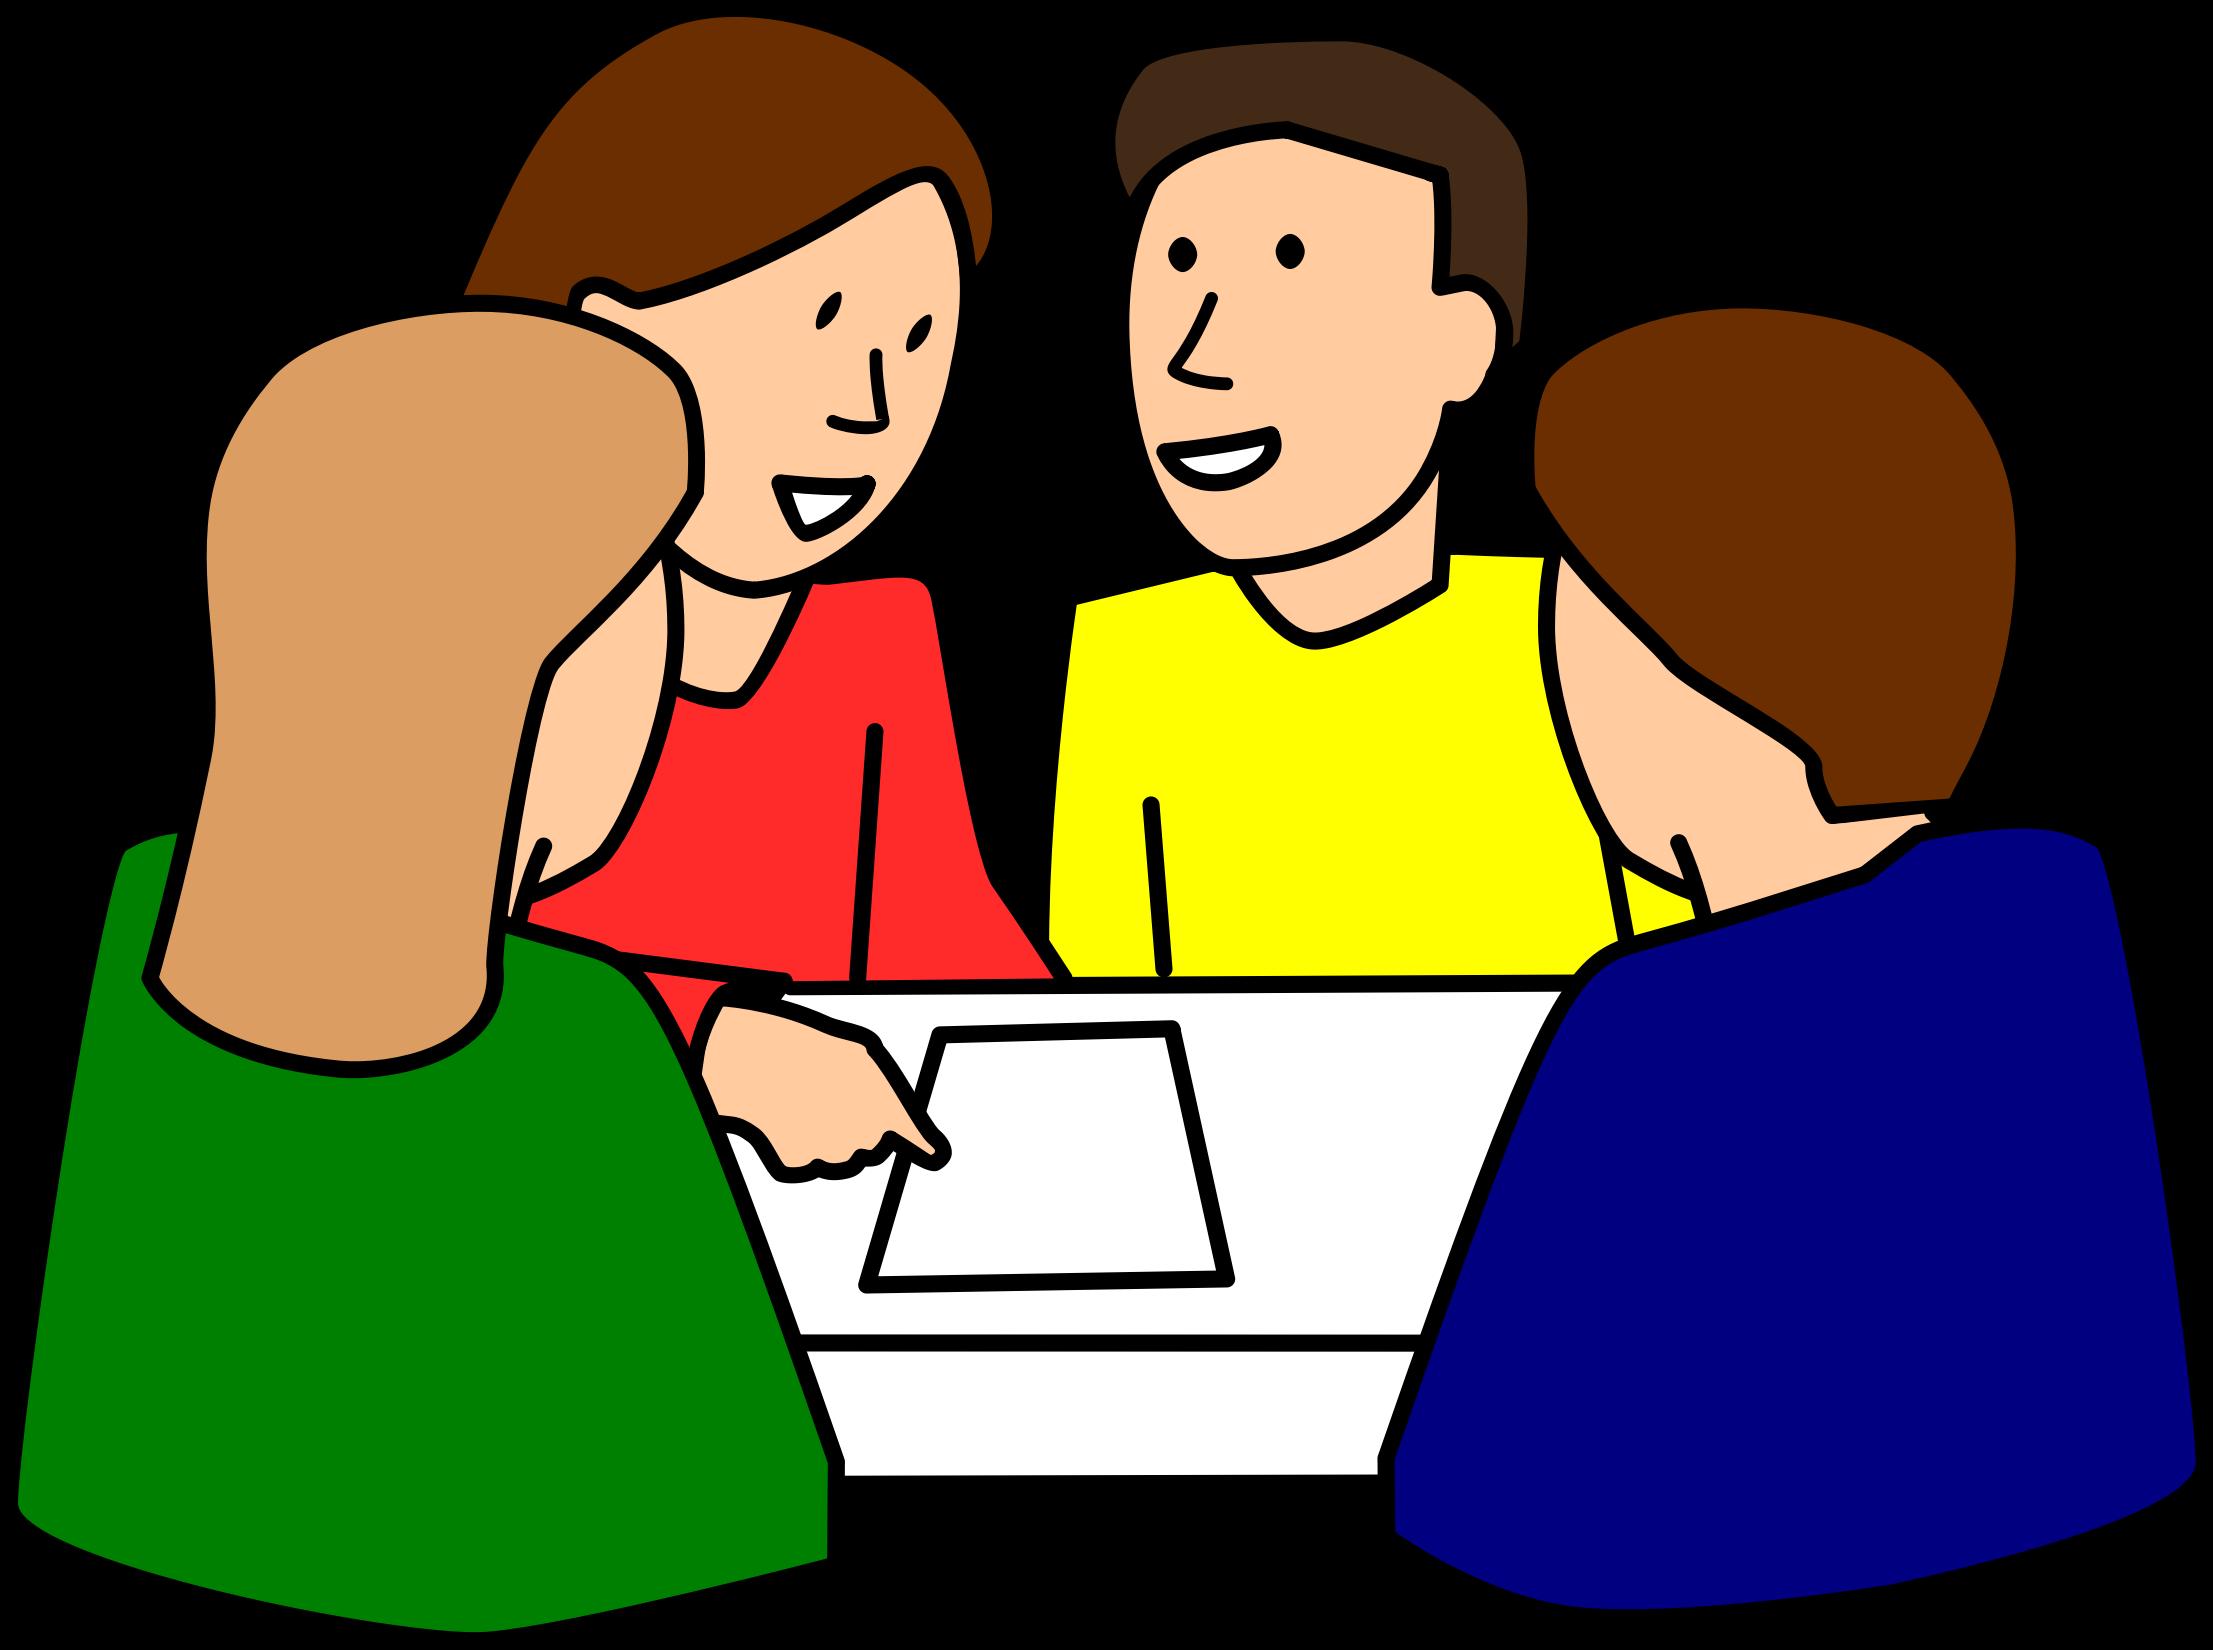 Clipart school work clip art library download Clipart - students group work clip art library download